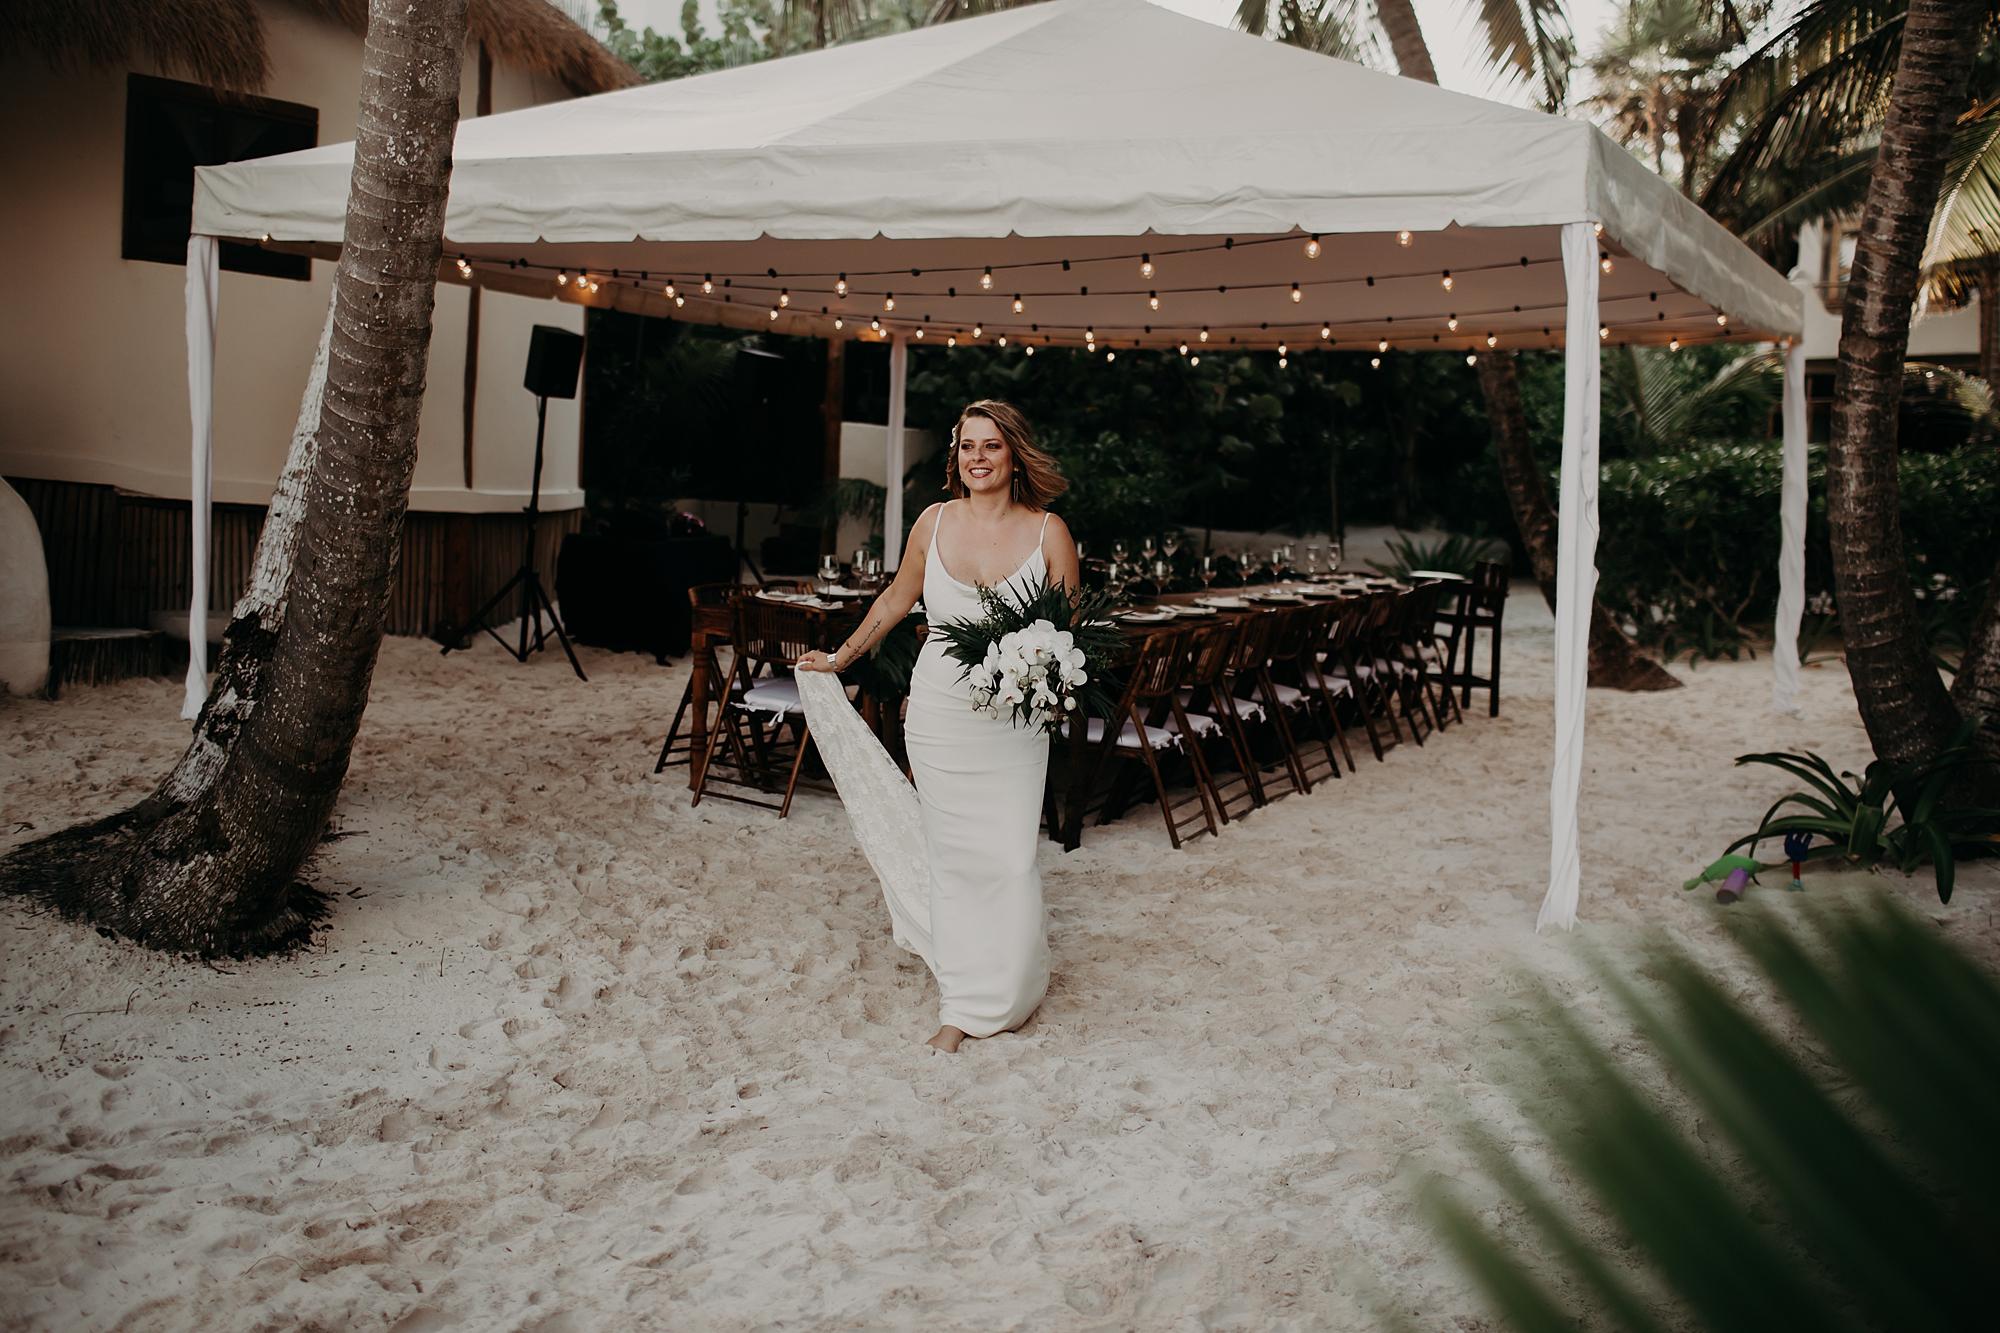 Danielle-San-Antonio-Wedding-Photographer-138_WEB.jpg